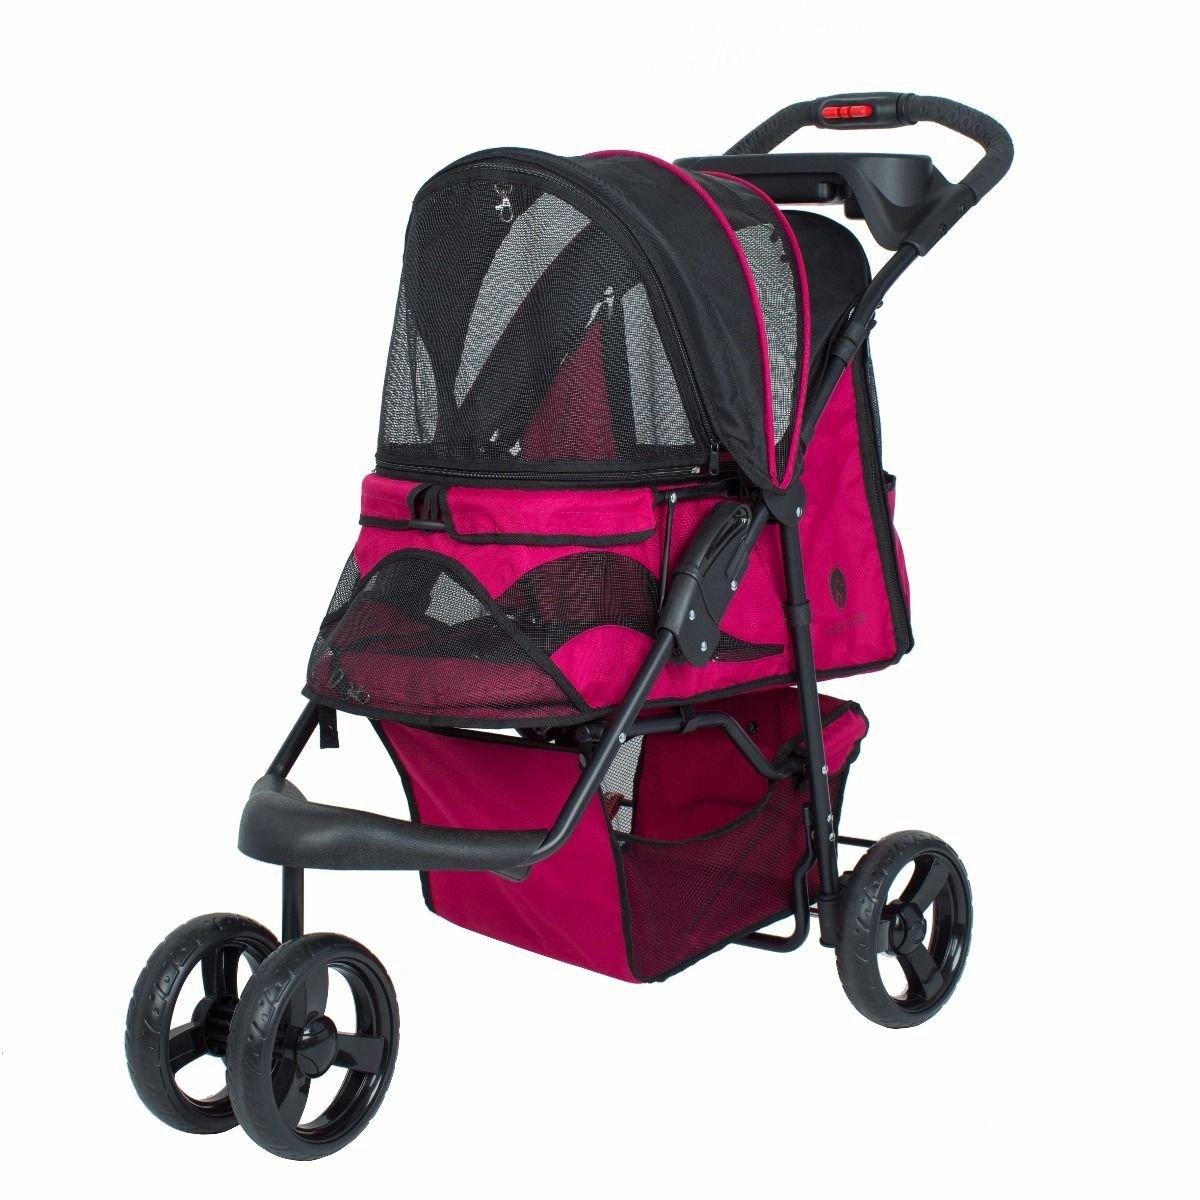 Petique Razzberry Pet Stroller, Razzberry, One Size